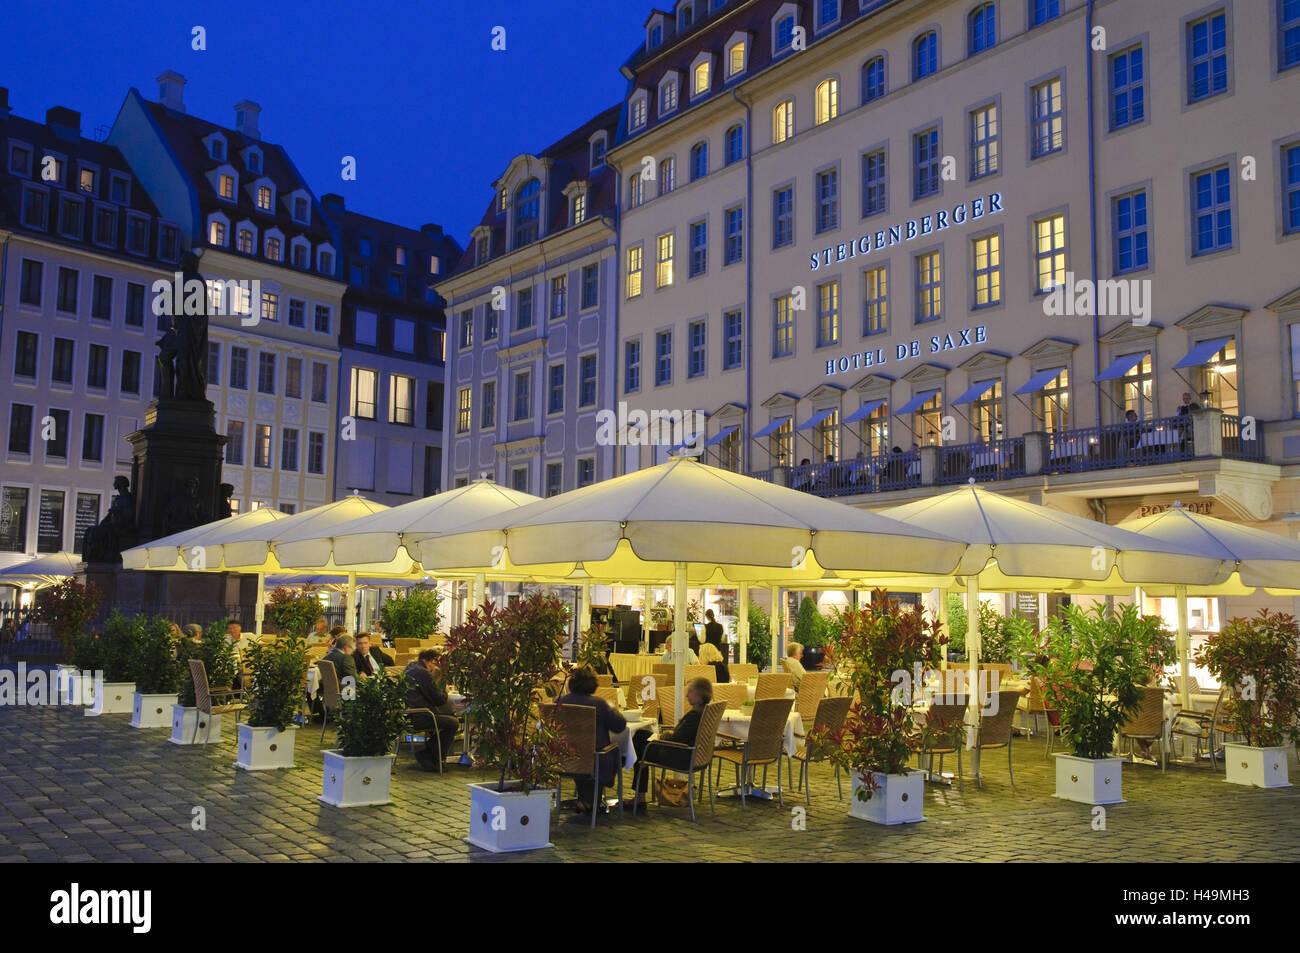 New Market Hotel De Saxe Monument Friedrich August Ii